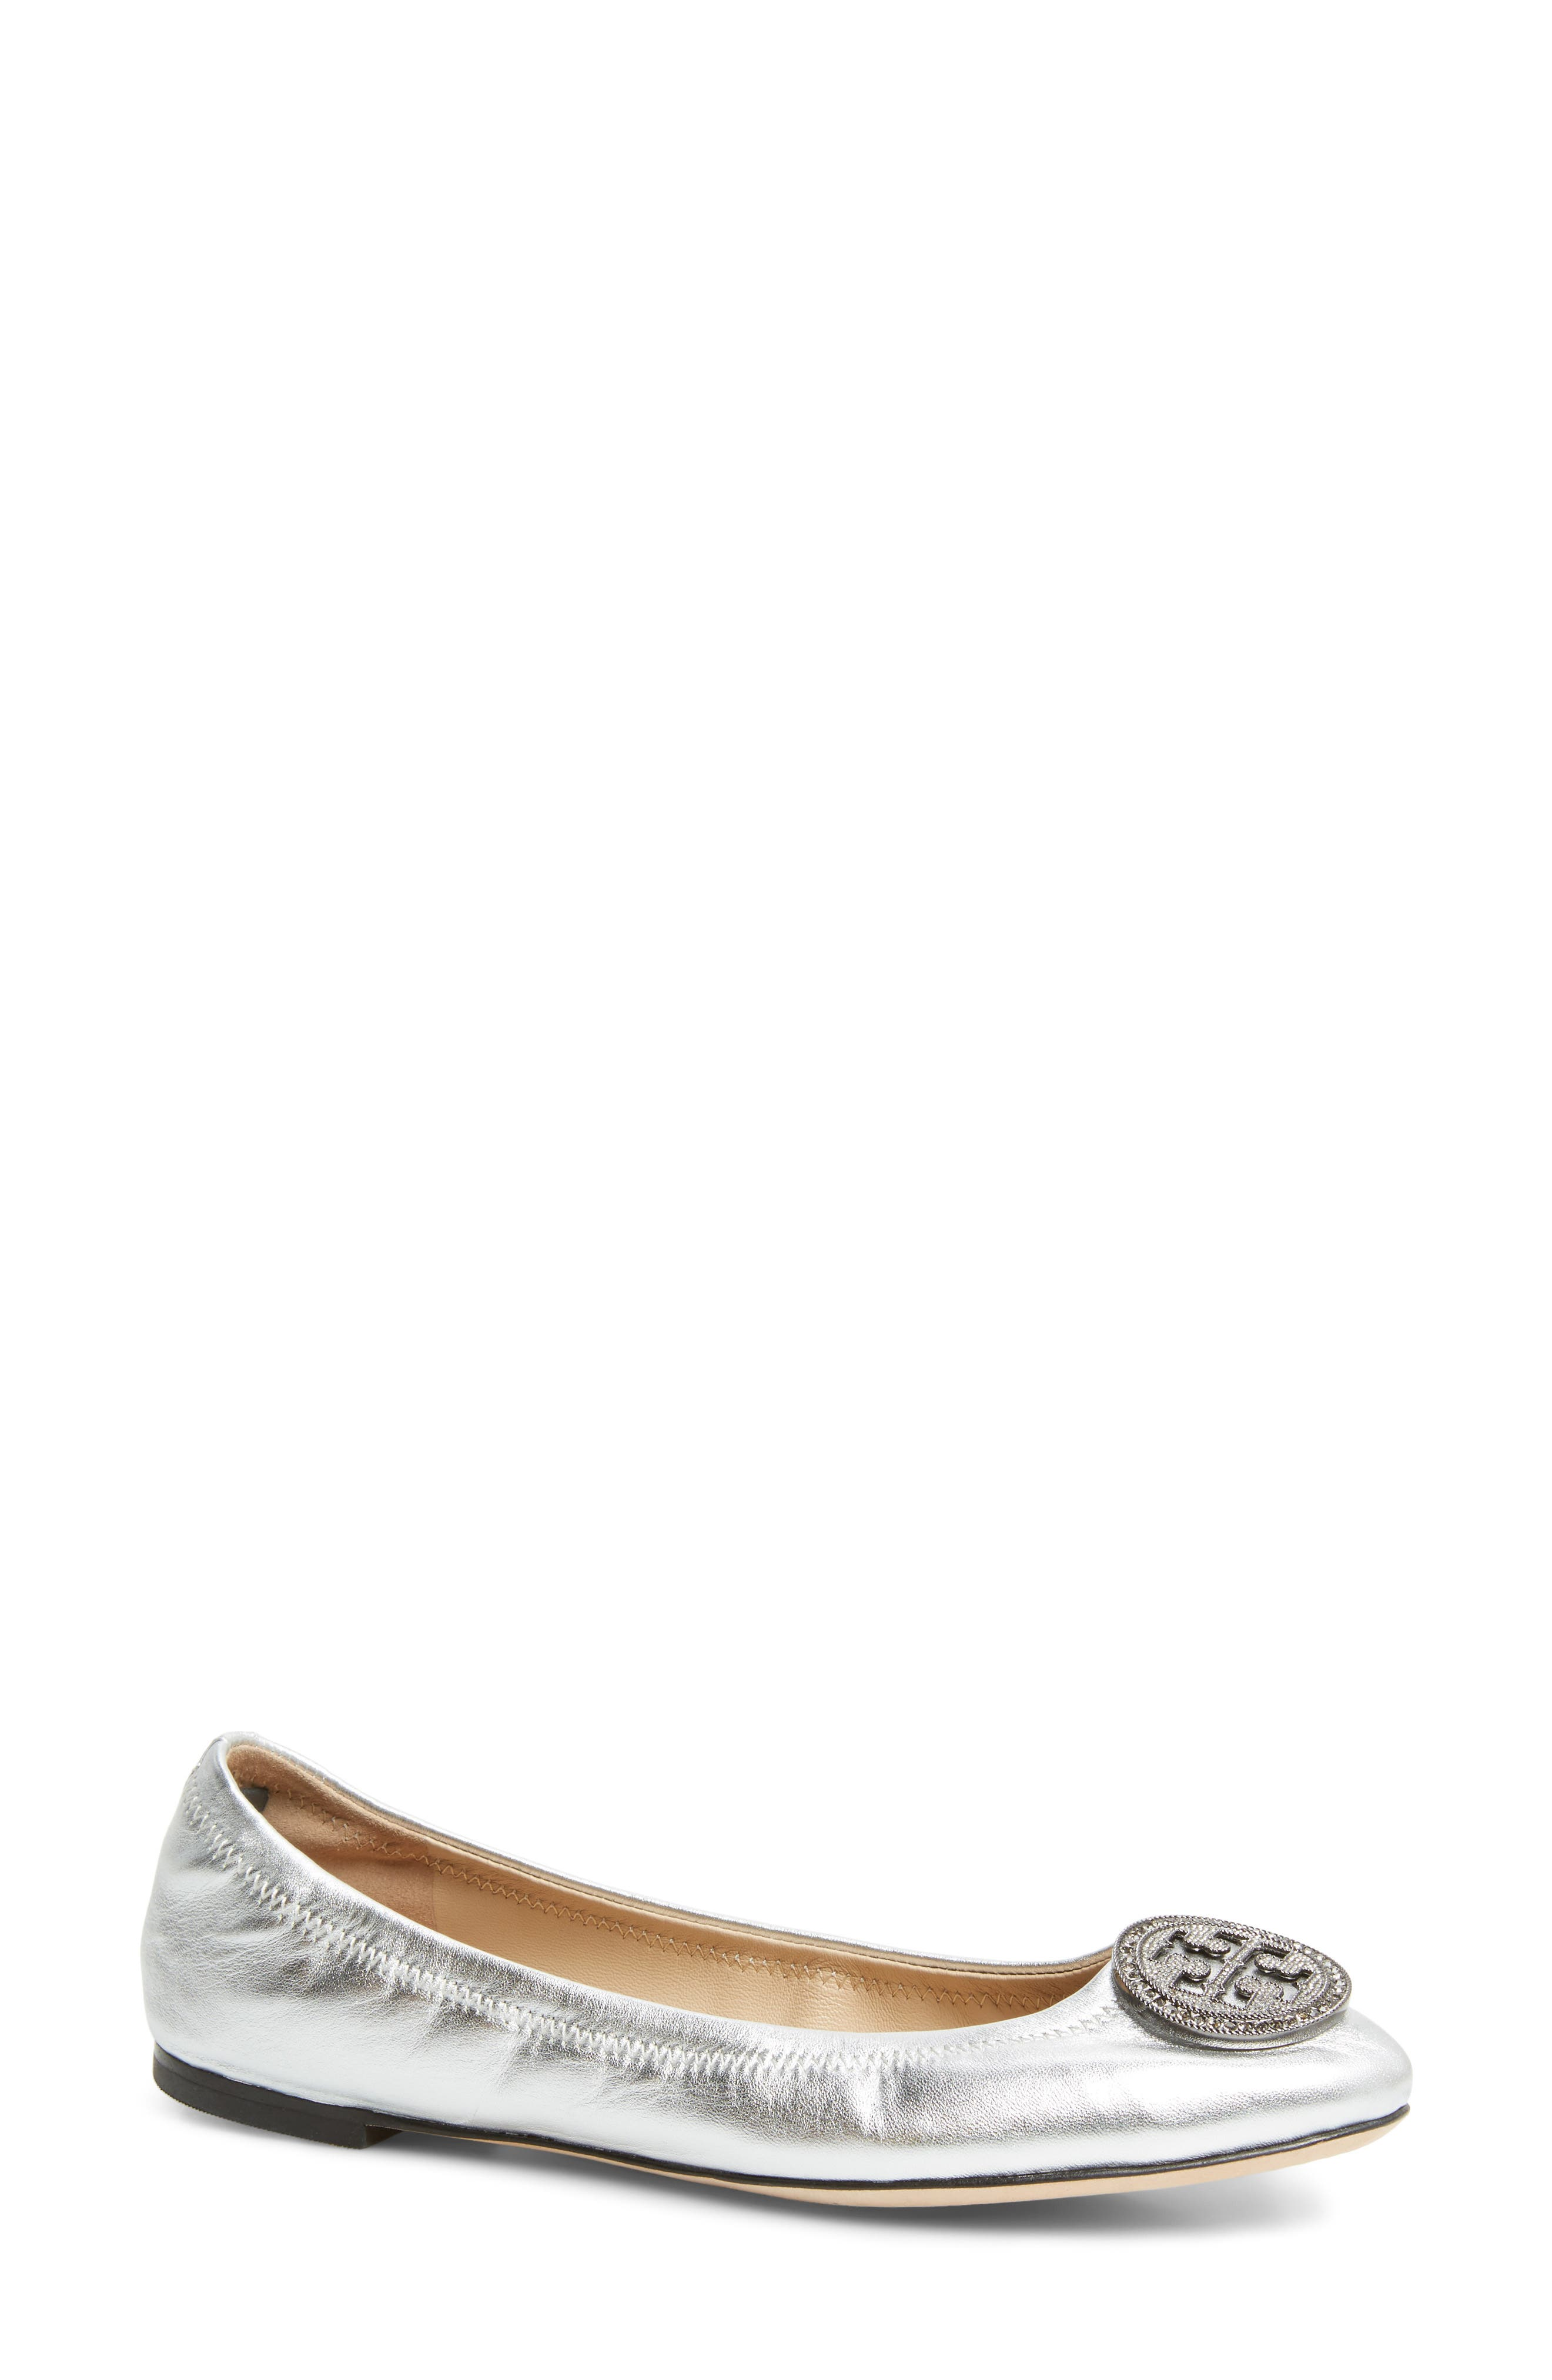 Liana Ballet Flat,                         Main,                         color, Silver